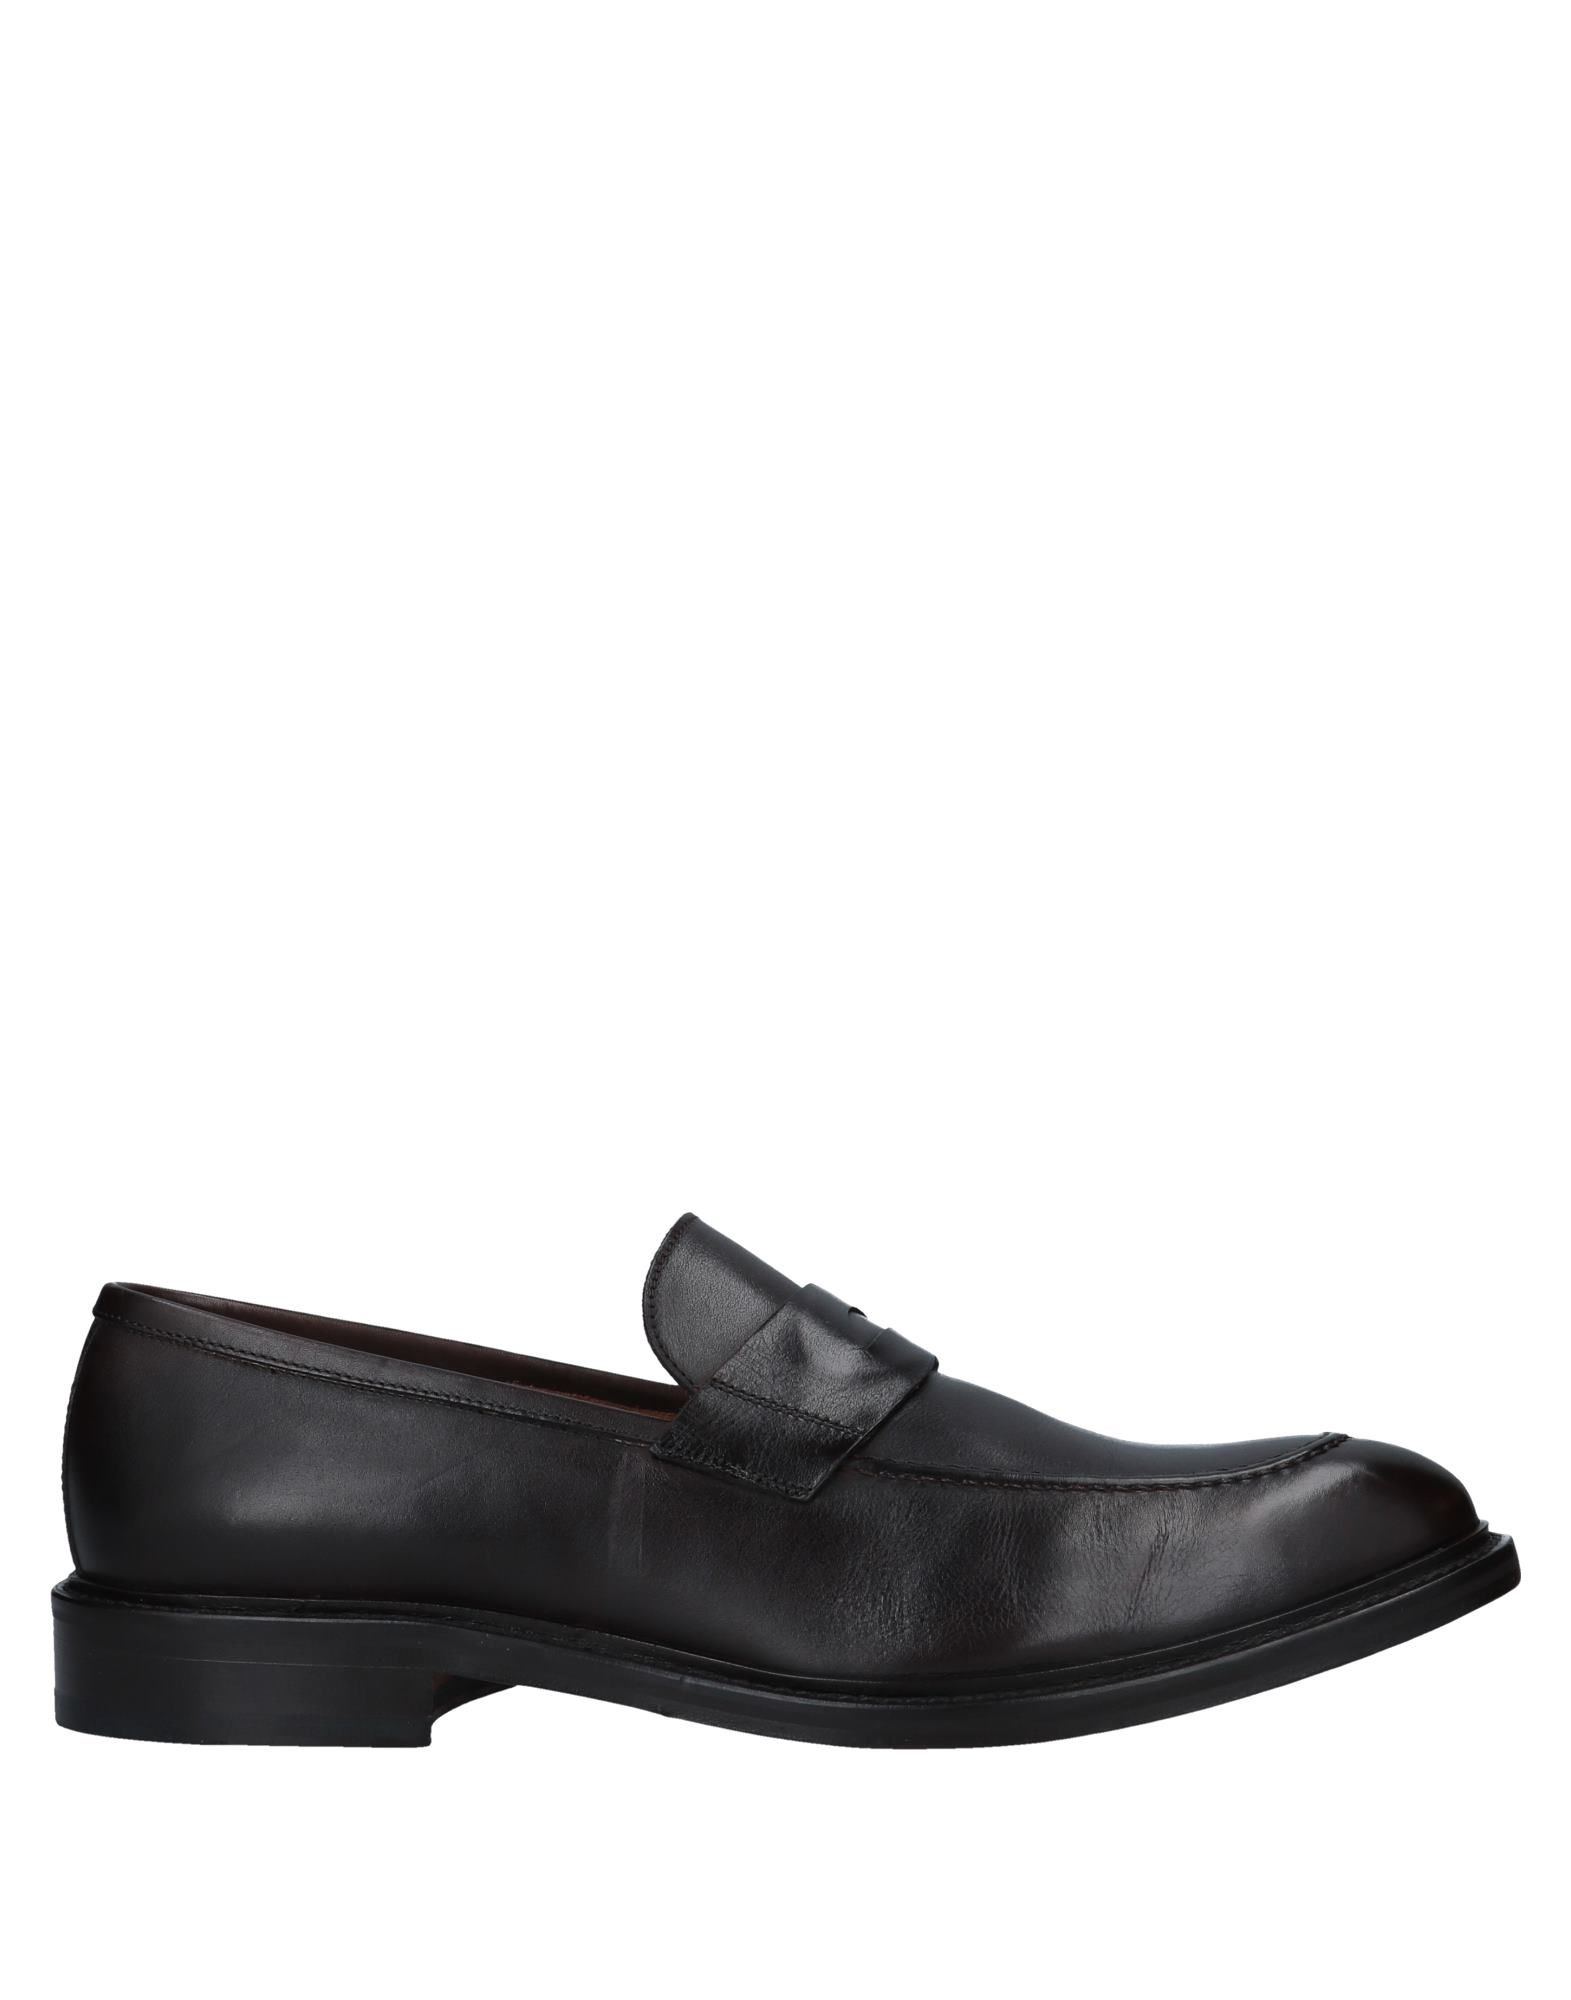 Baldinini Mokassins Herren Qualität  11554835FX Gute Qualität Herren beliebte Schuhe b7aada